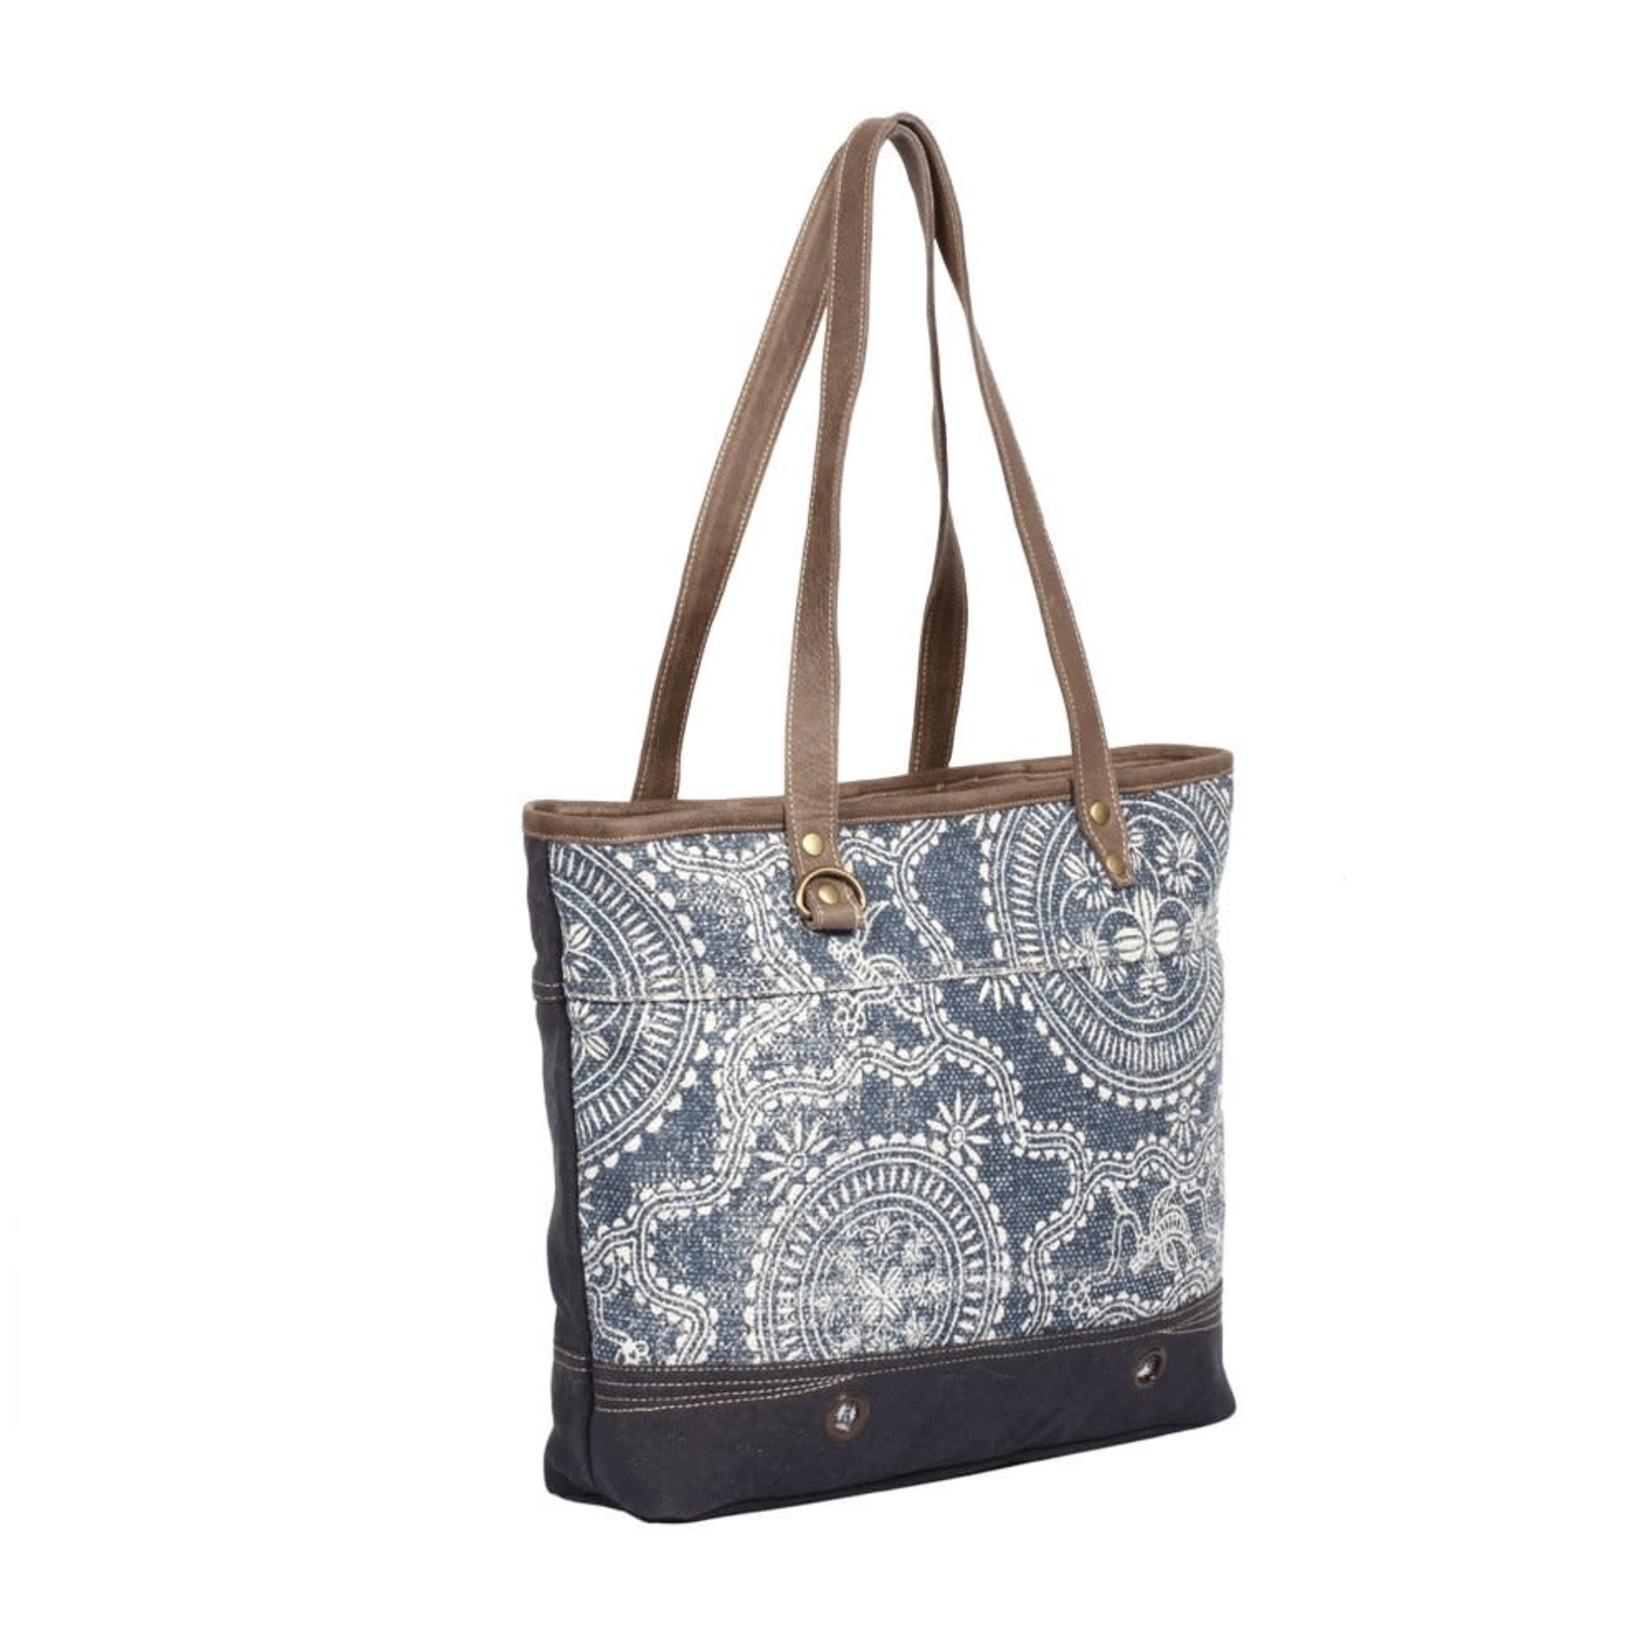 Myra Bags S-1323 Drawstring Style Tote Bag